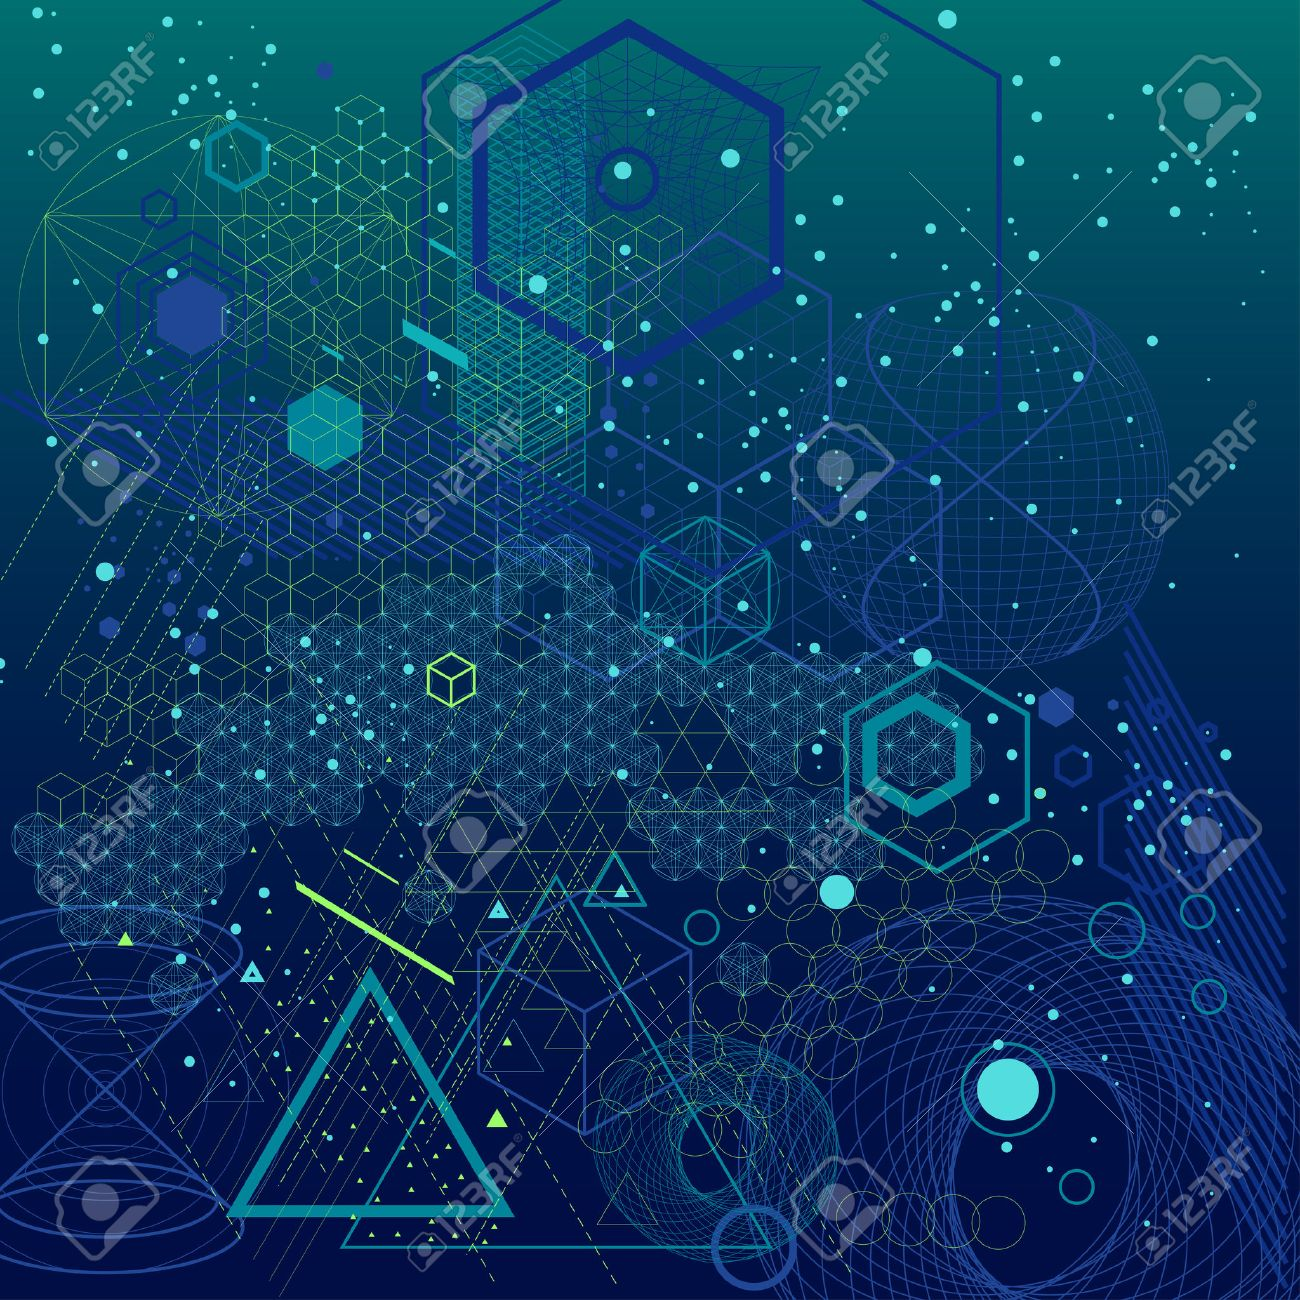 Sacred Geometry Symbols And Elements Background Cosmic Universe 1300x1300